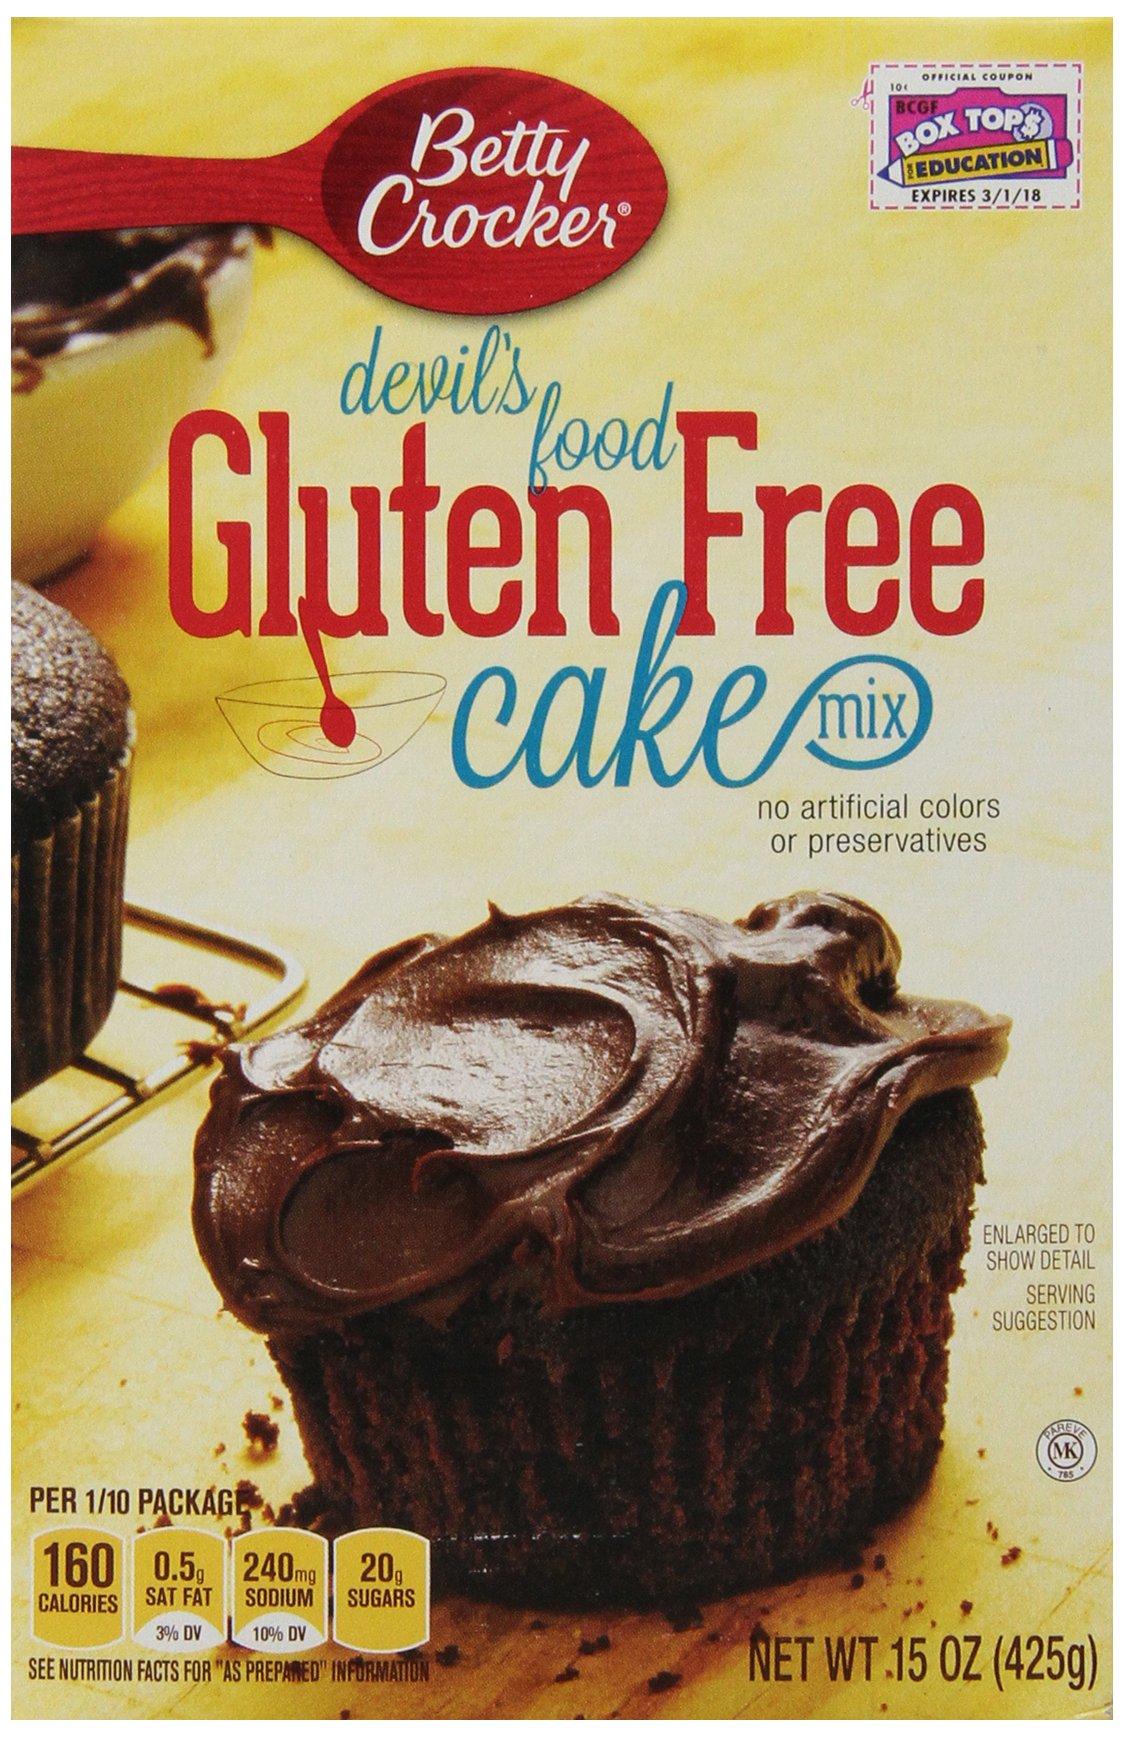 Betty Crocker Baking Mix, Gluten Free Cake Mix, Devil's Food, 15 Oz Box (Pack of 6) by Betty Crocker